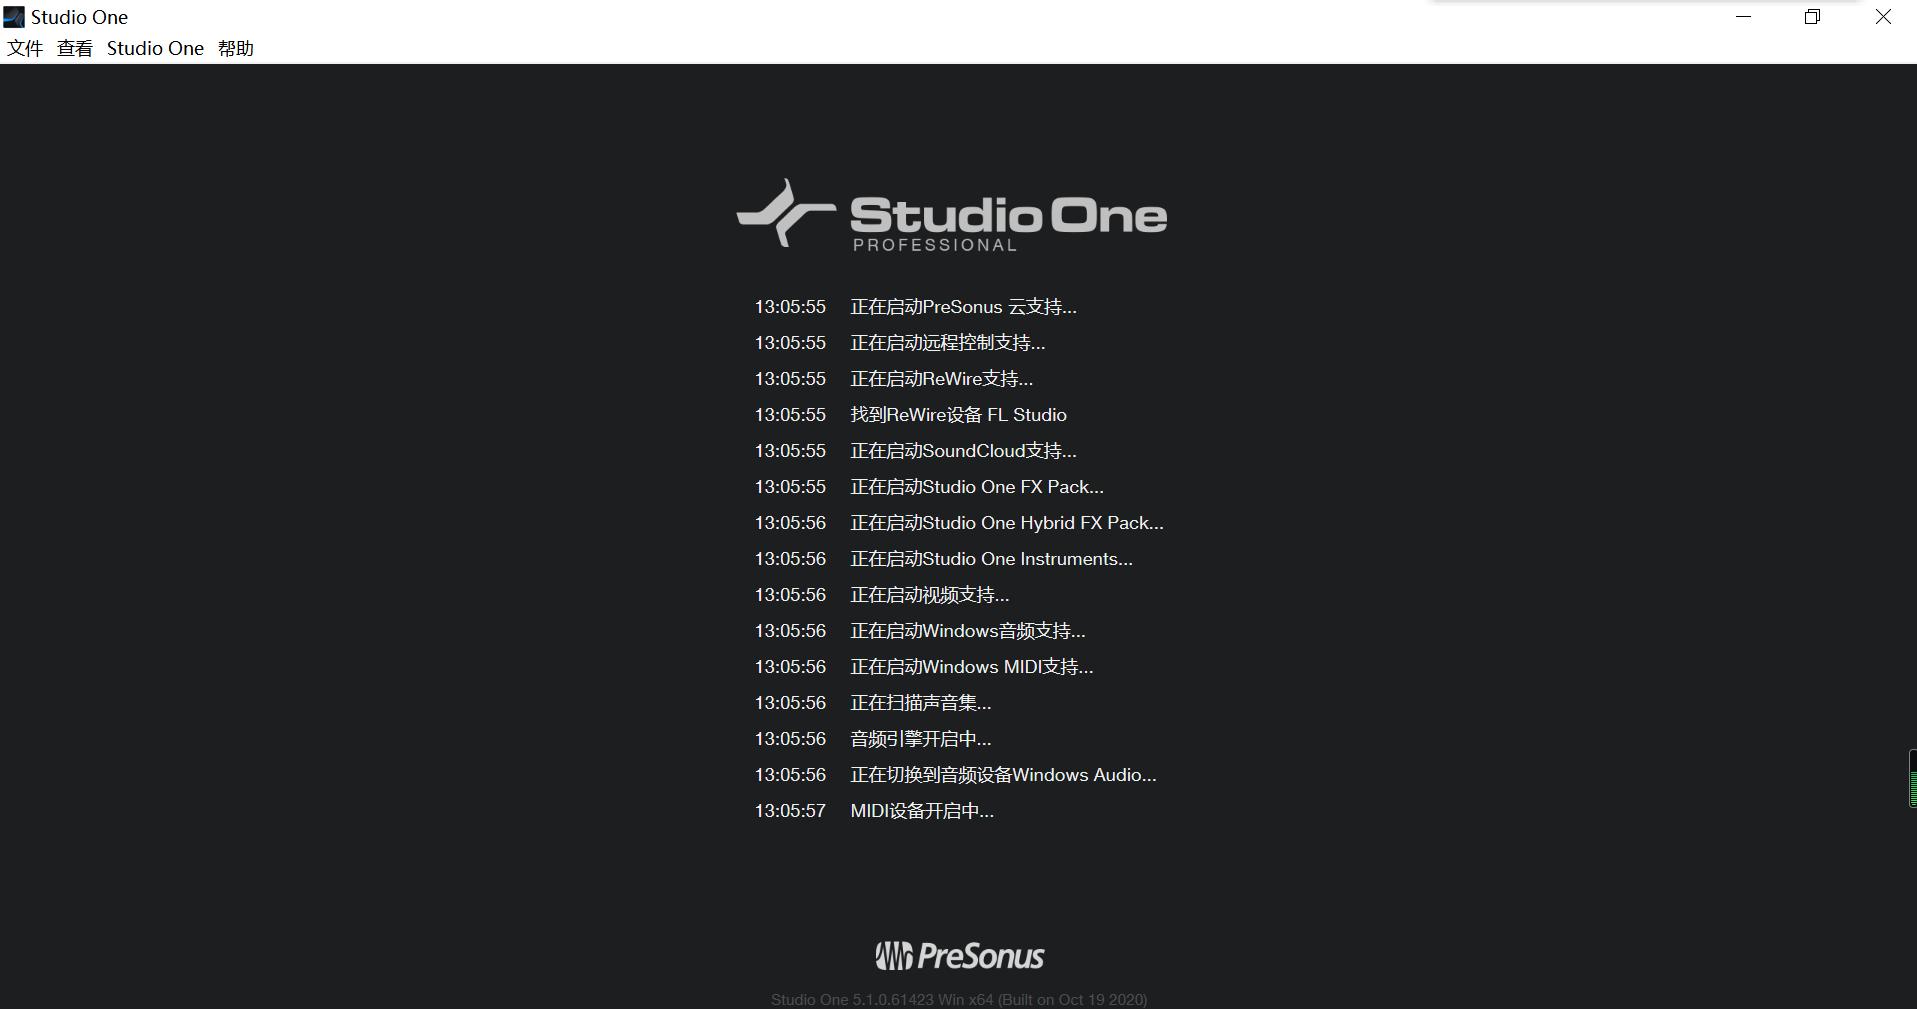 Studio One载入页